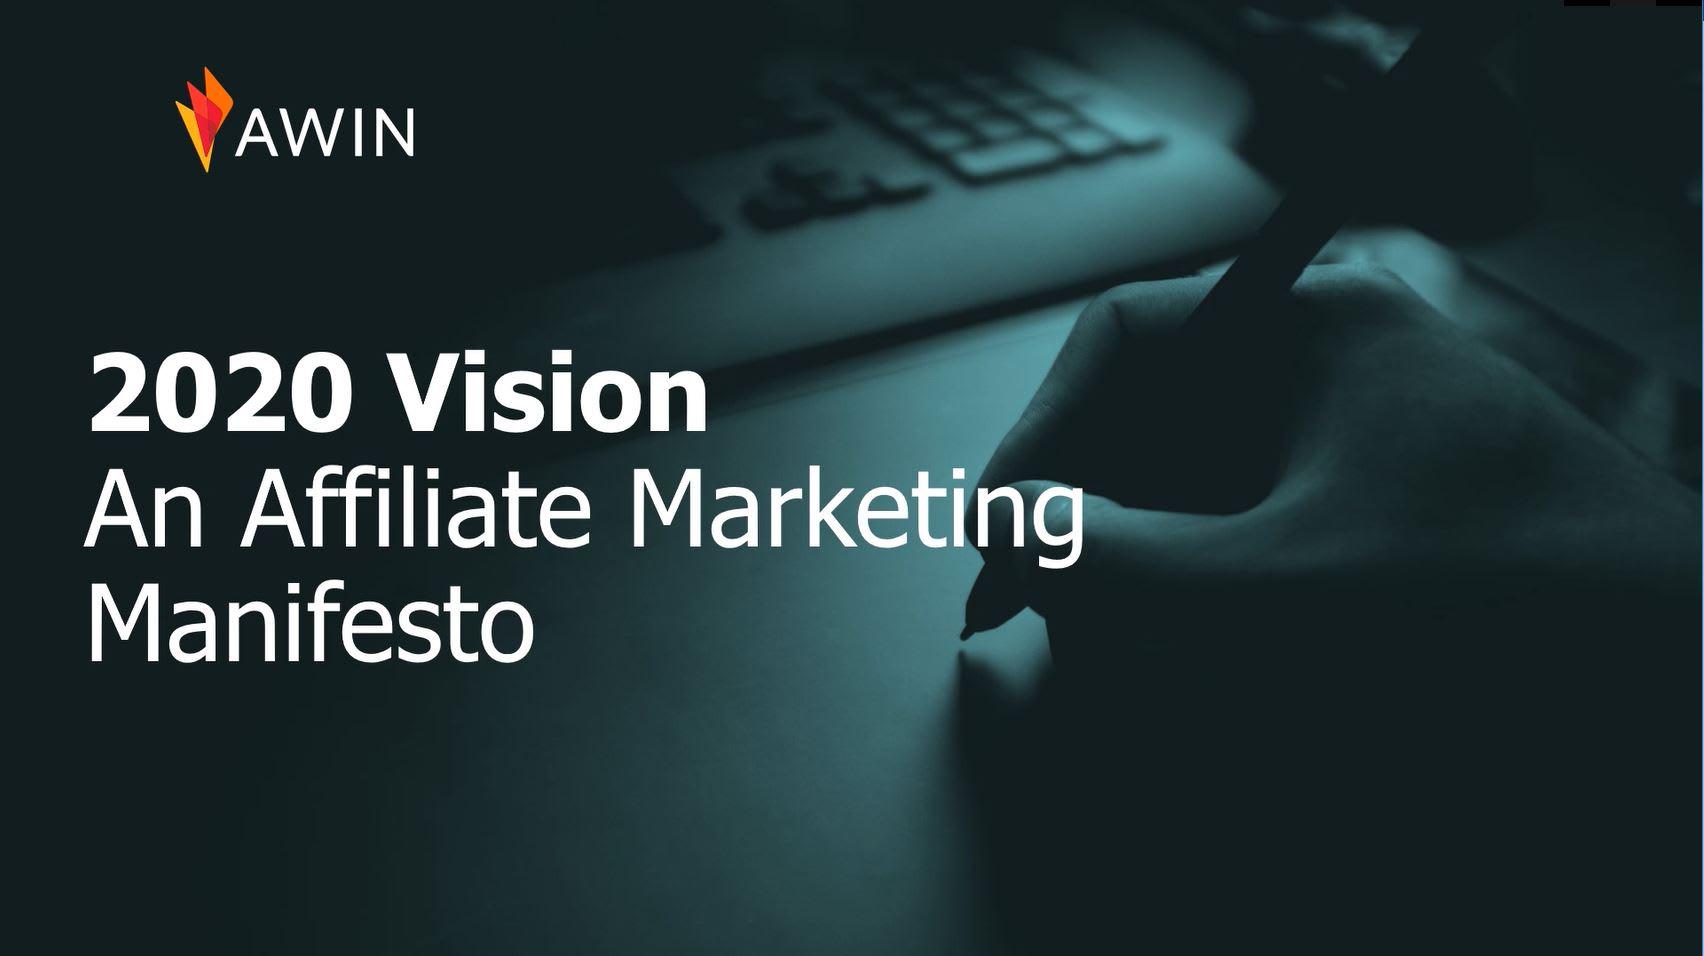 2020 vision an affiliate marketing manifesto